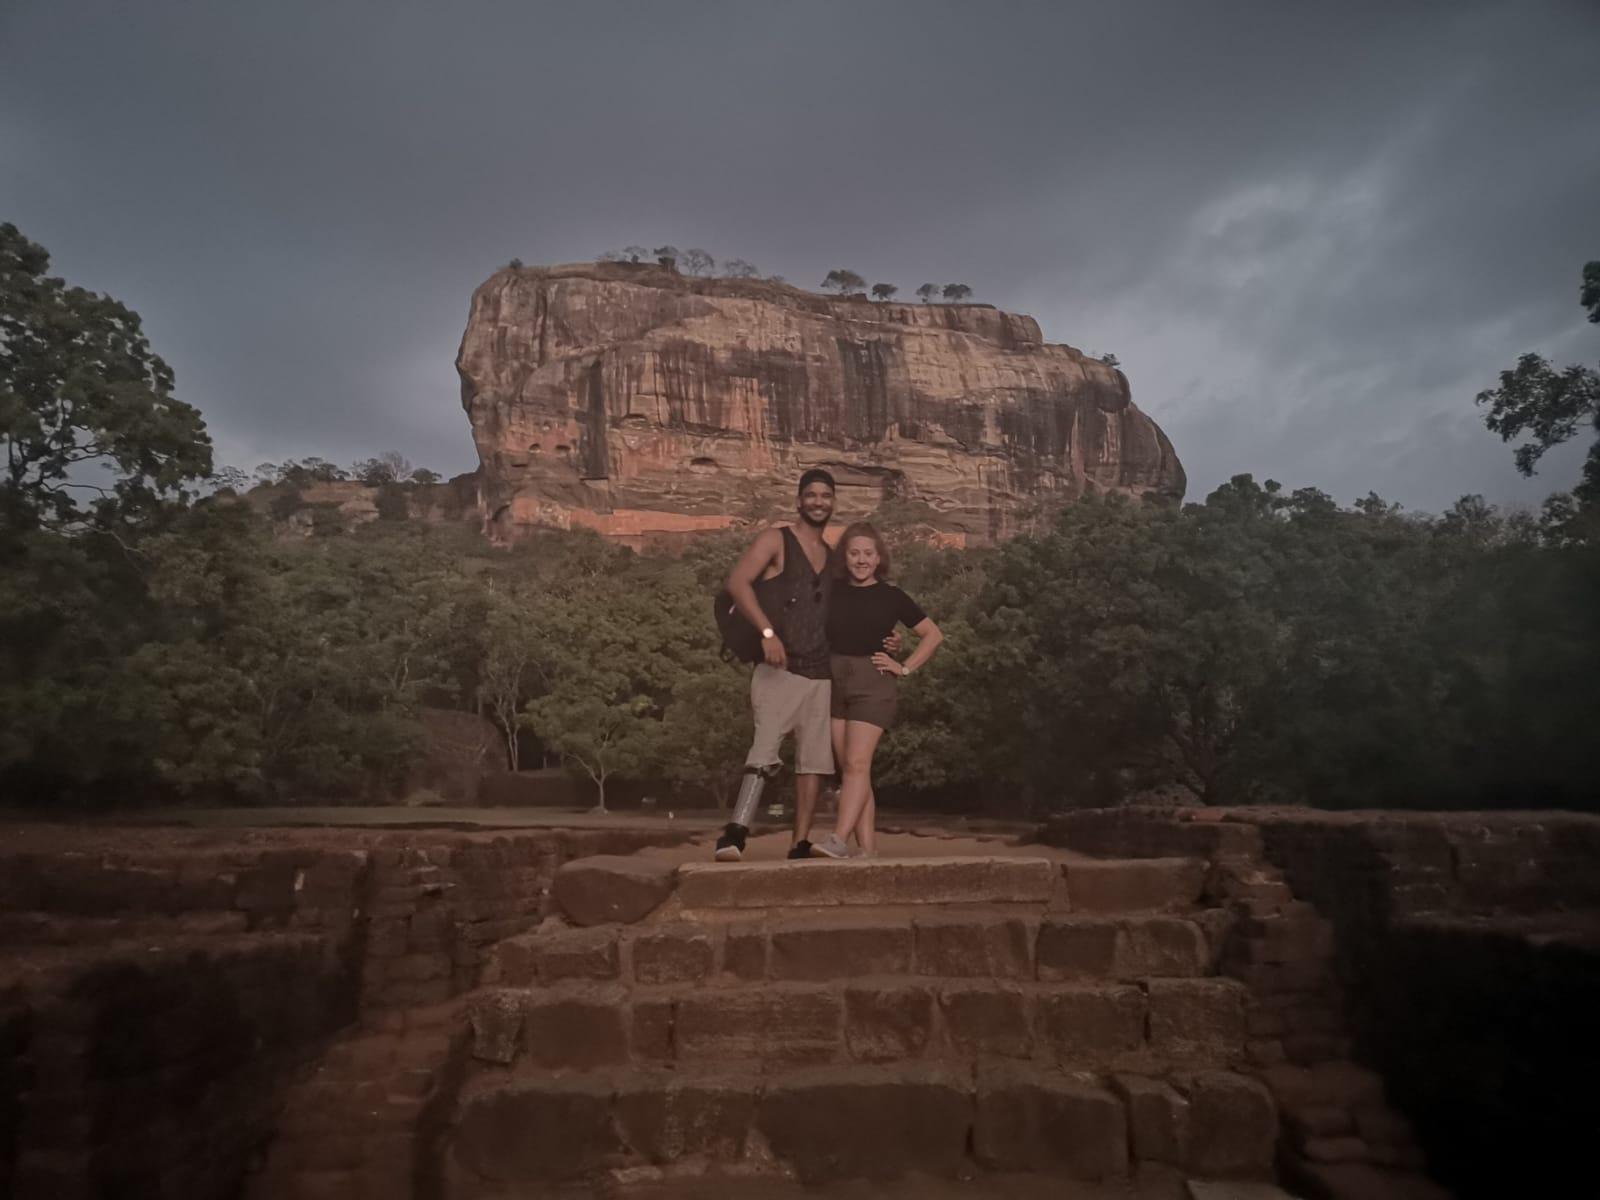 invite-to-paradise-sri-lanka-holiday-honeymoon-specialists-customer-feedback-elin-jordan-luce-sigiriya.JPG